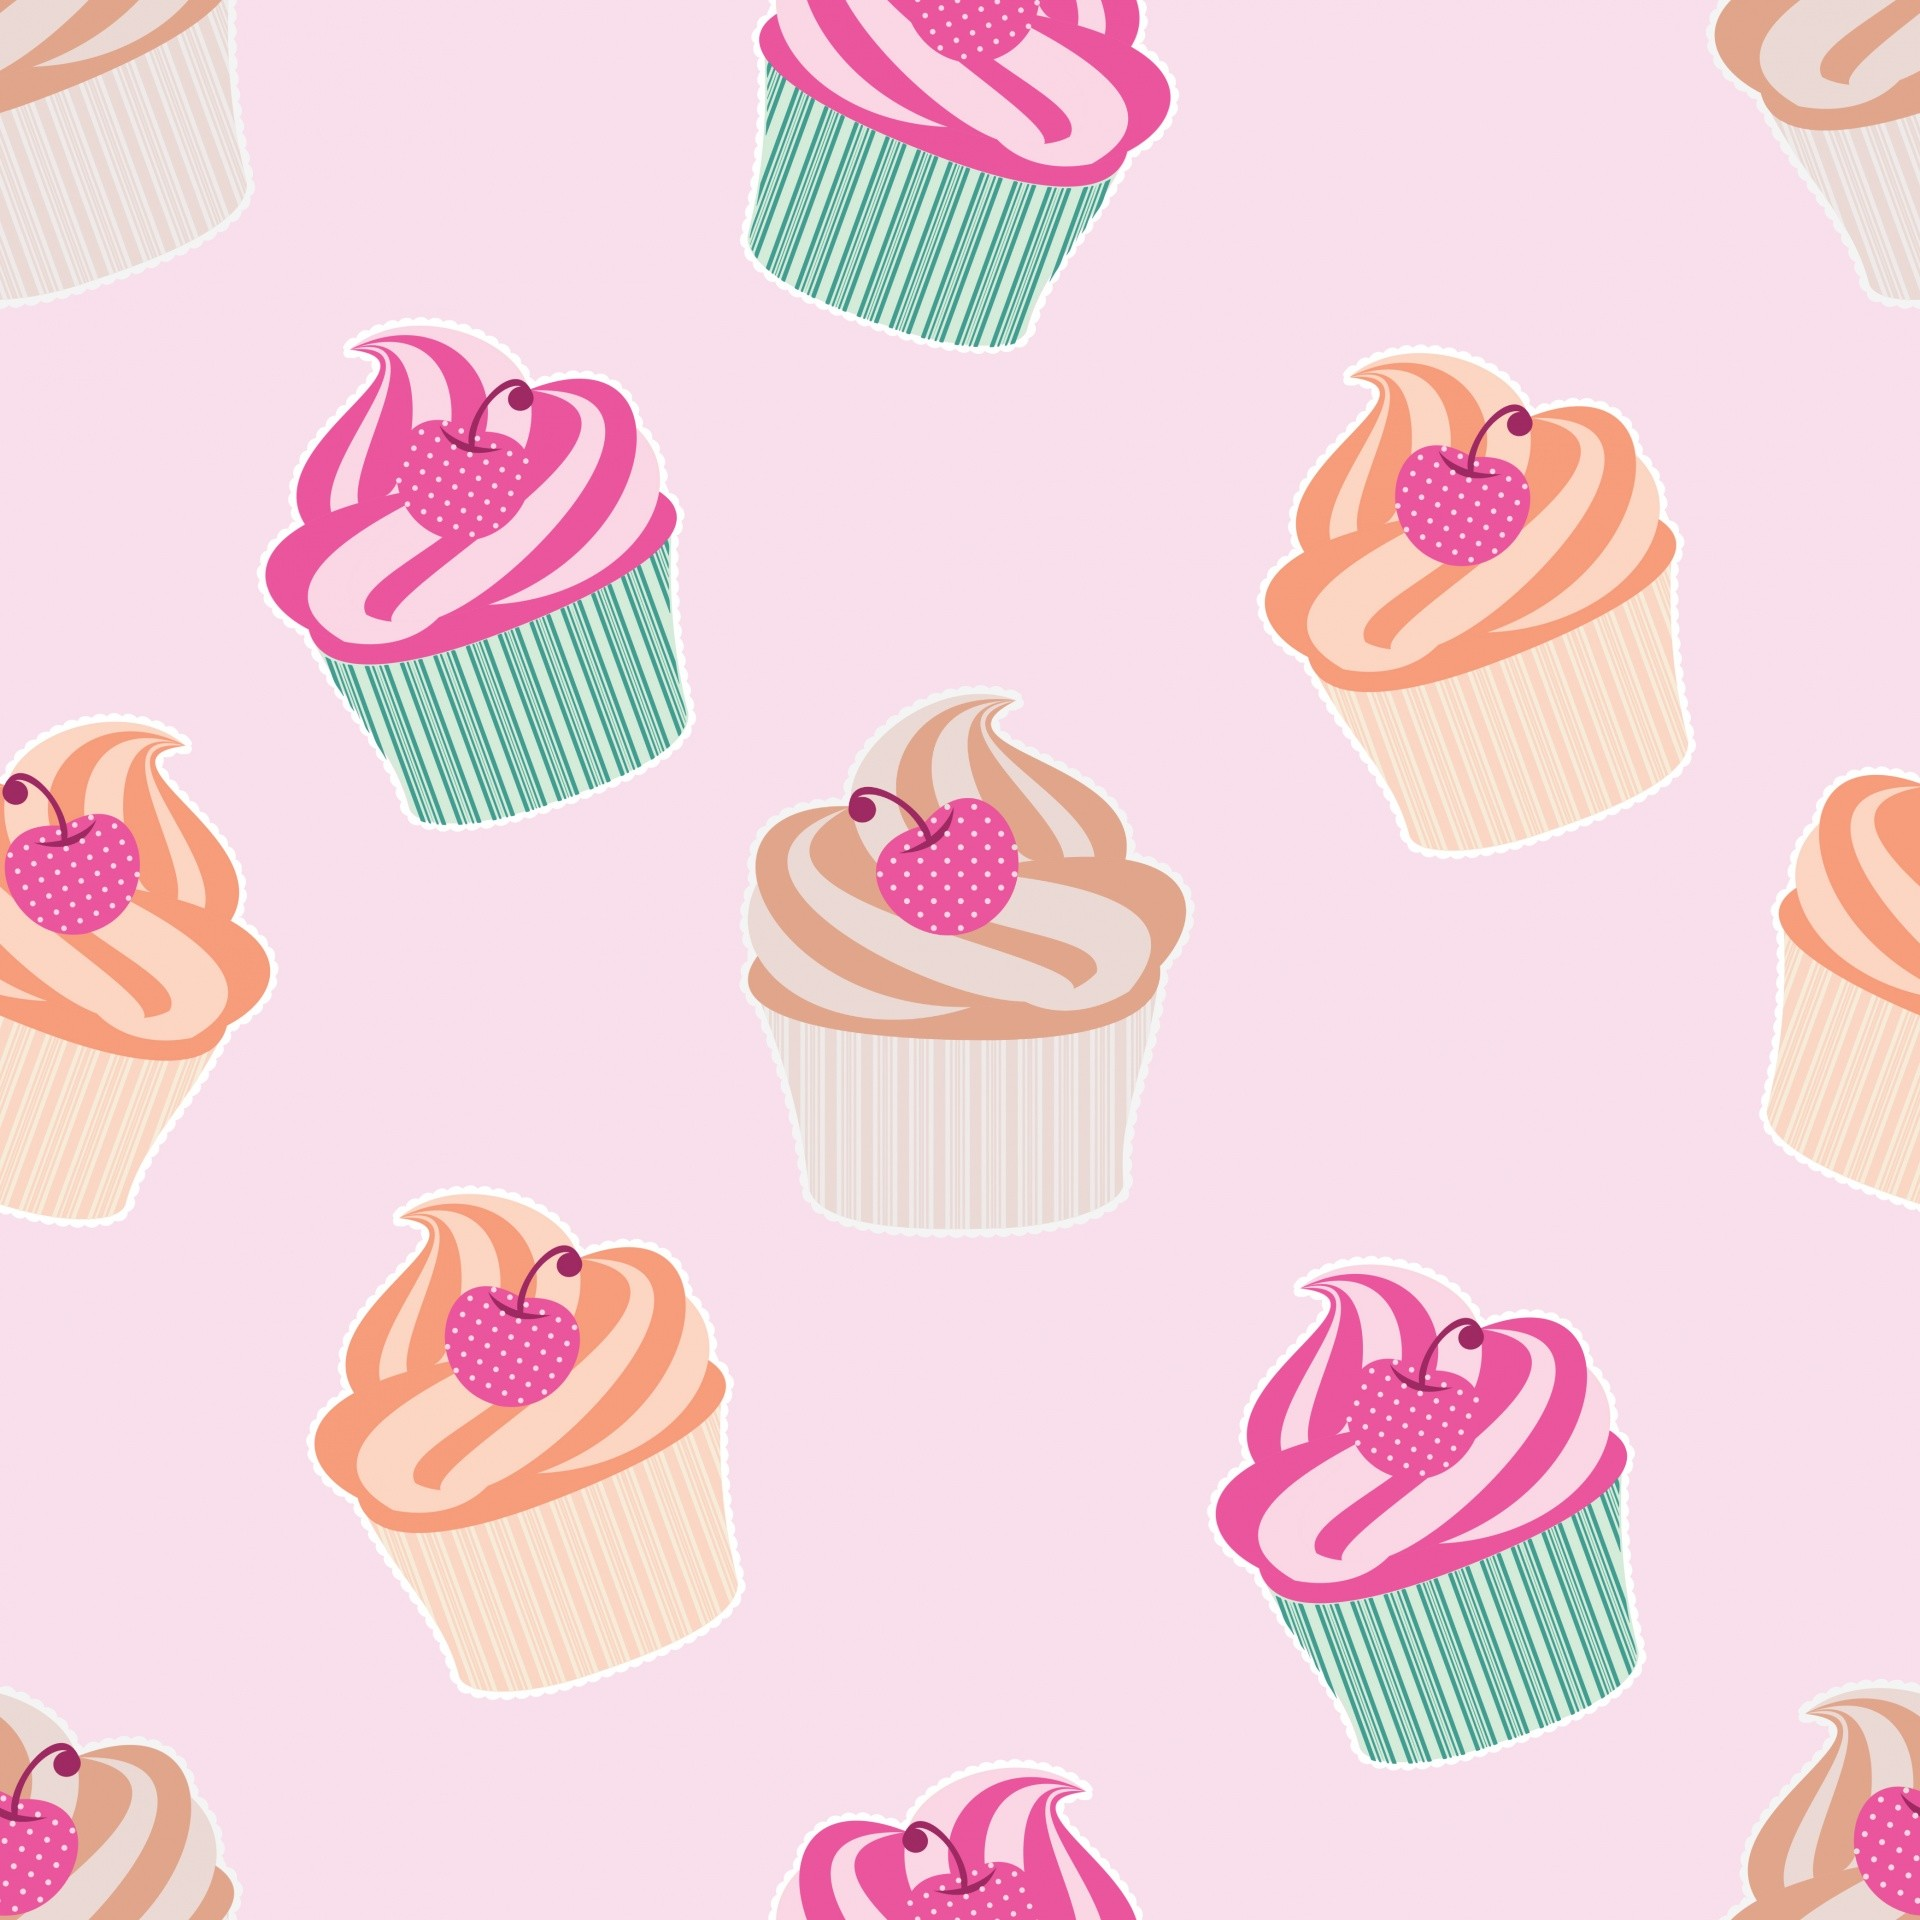 Best Wallpaper Hd For Iphone 6 Cute Cupcakes Wallpaper 183 ①